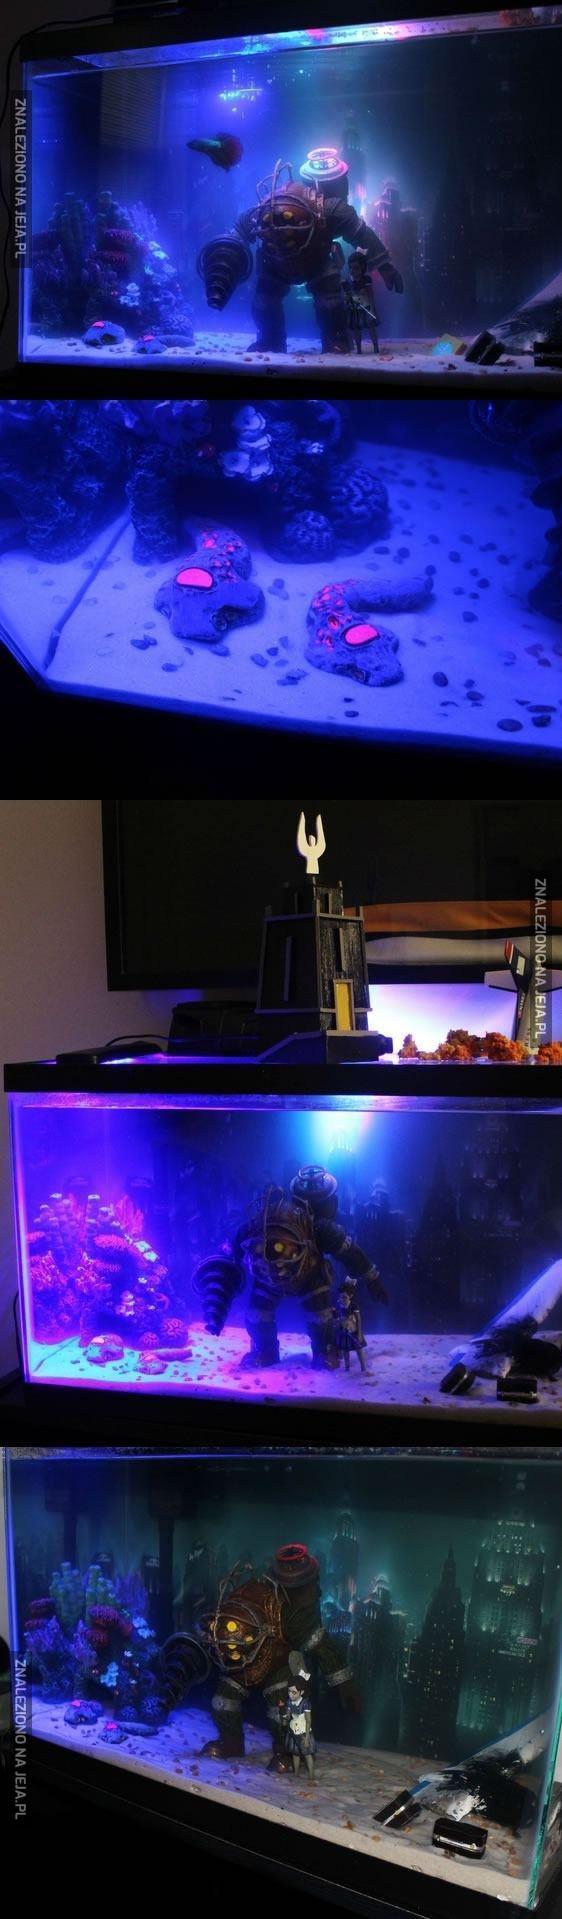 Akwarium w stylu Bioshock